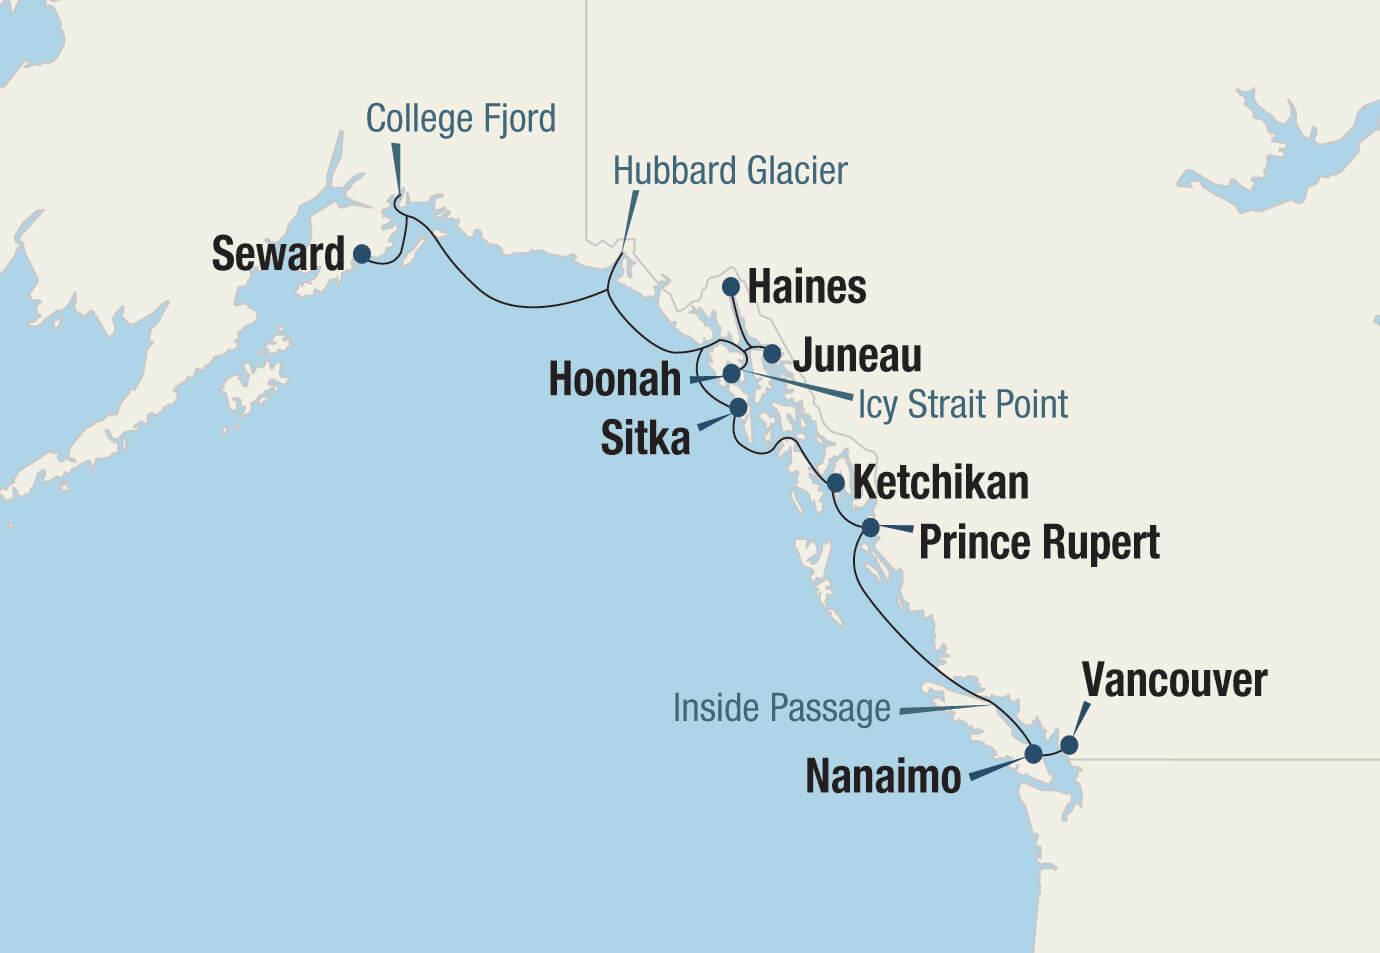 Icy Strait Point Alaska Map.Forests Fjords Of Alaska 7 30 2020 8 10 2020 Go Next